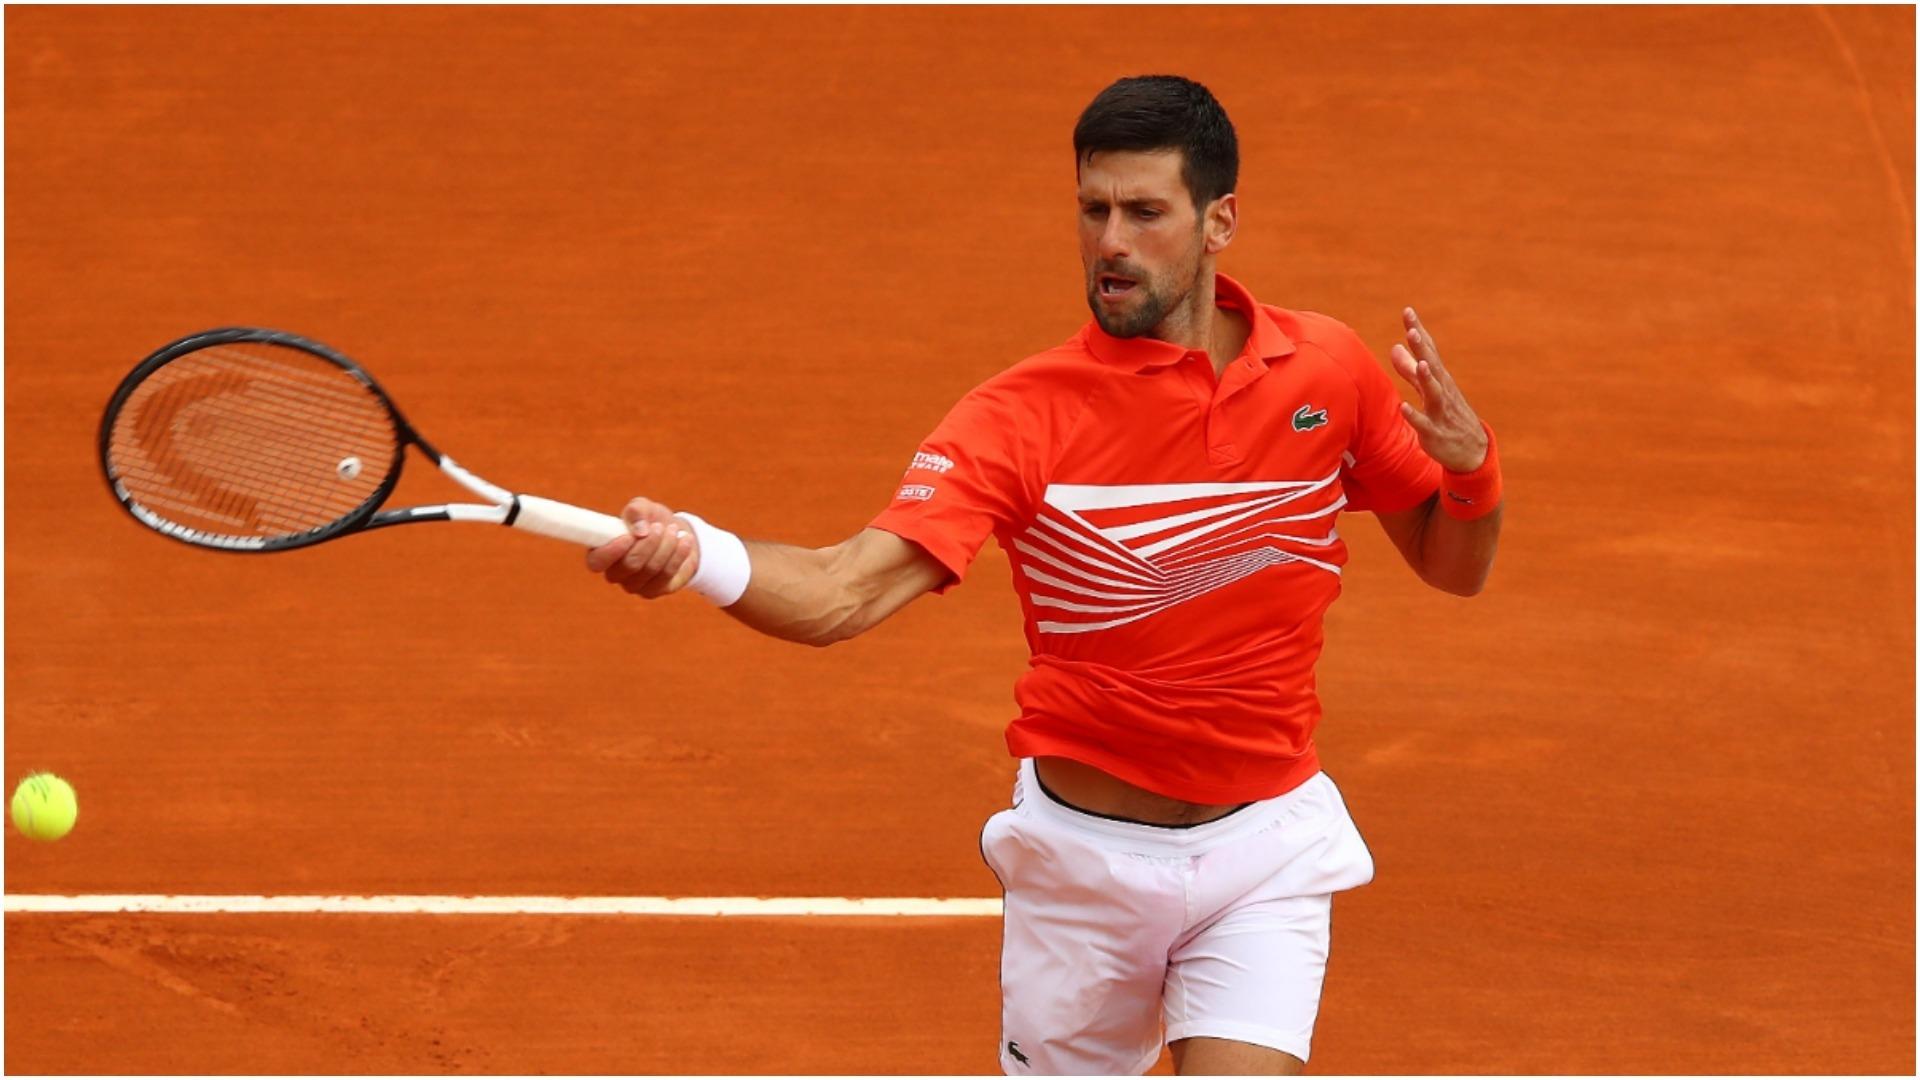 Novak Djokovic bate norte-americano e avança às oitavas em Madri